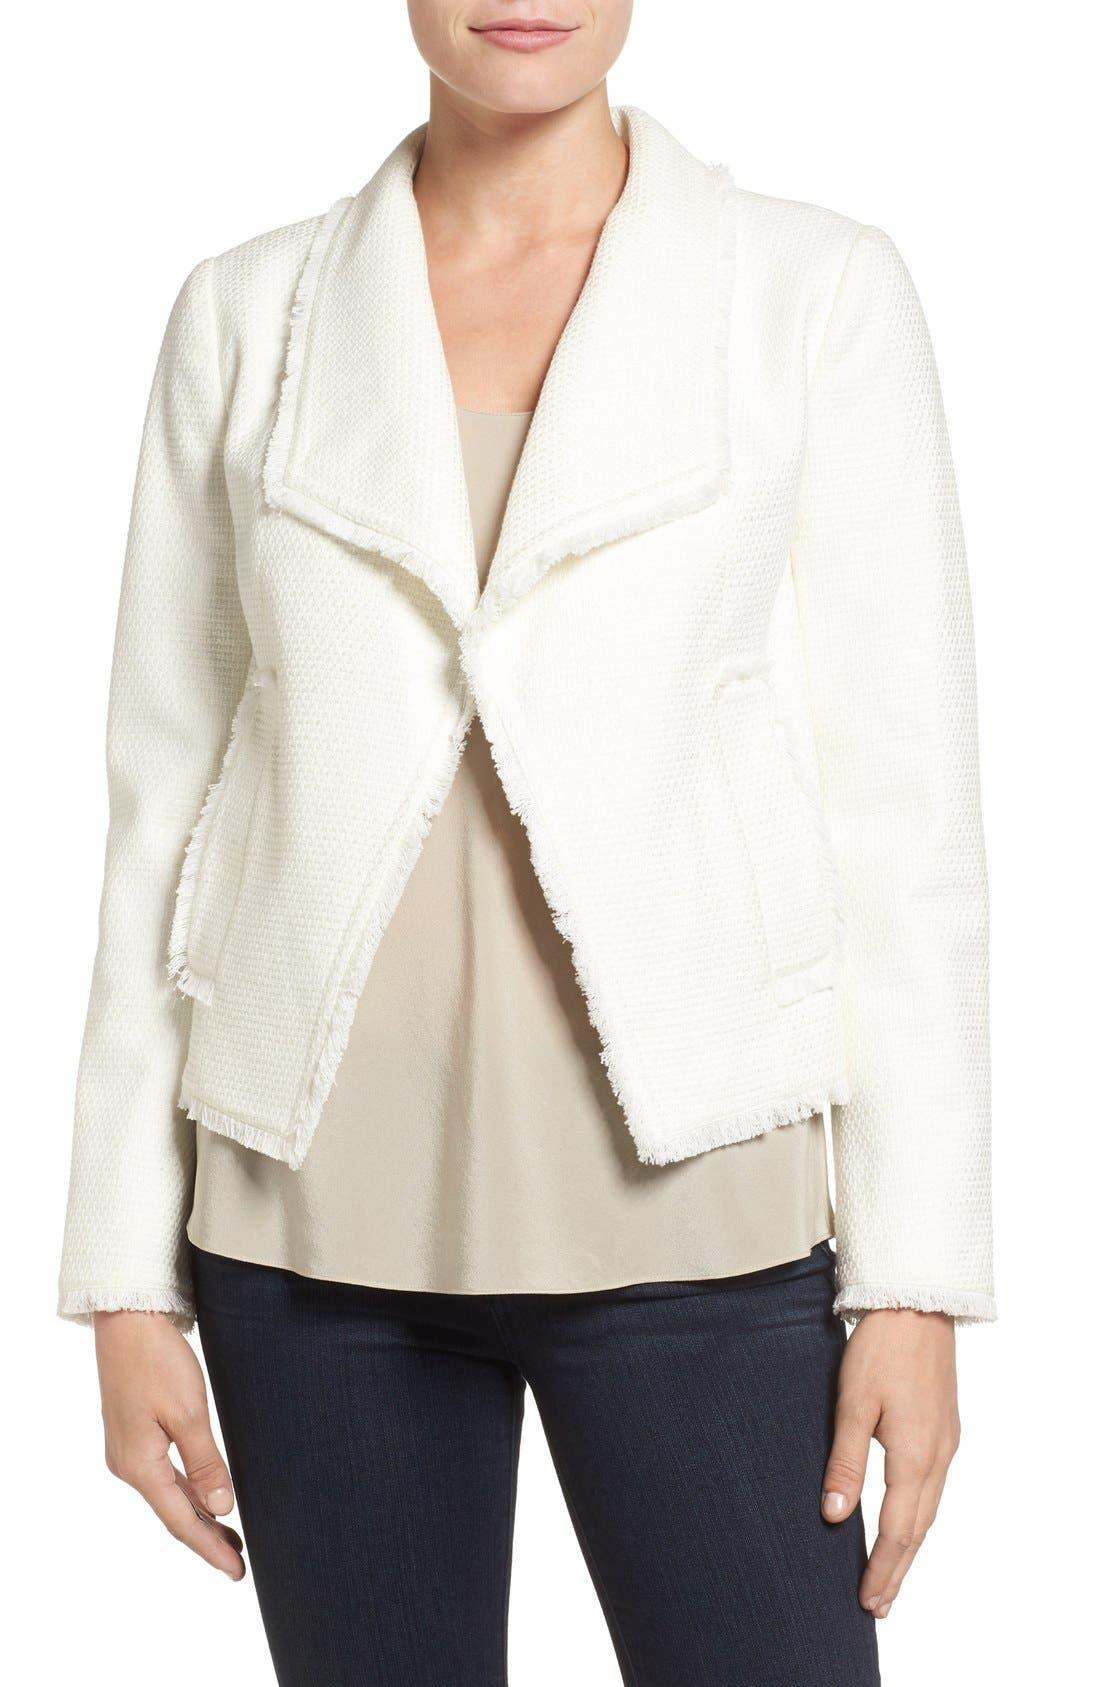 Main Image - MICHAEL Michael Kors Tweed Jacket